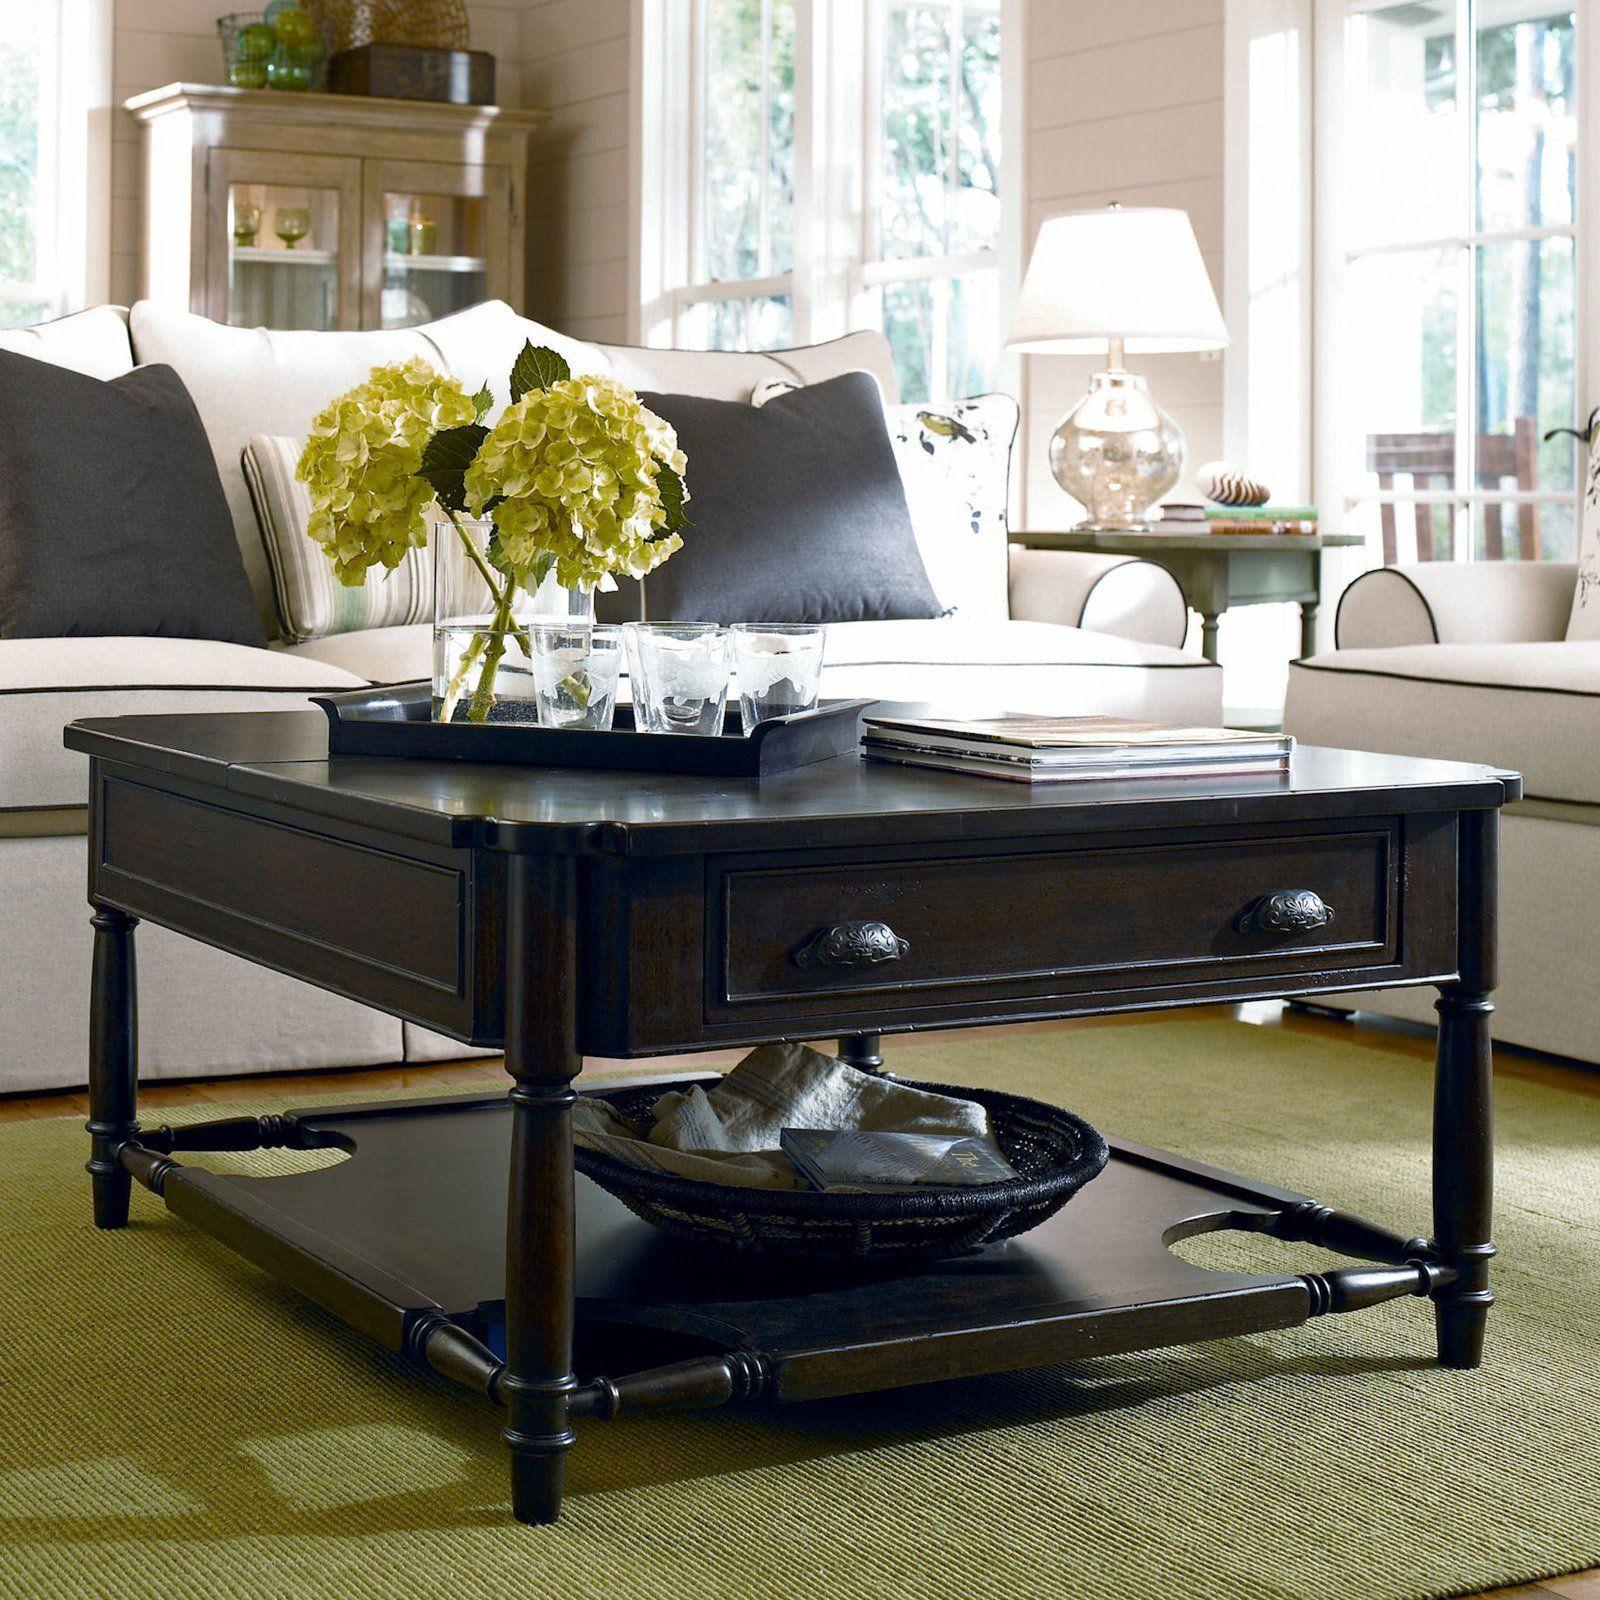 Paula Deen Down Home Visitin 39 Square Molasses Wood Lift Top Coffee Table 795 Hayneedle Com Coffee Table Paula Deen Furniture Furniture [ 1600 x 1600 Pixel ]